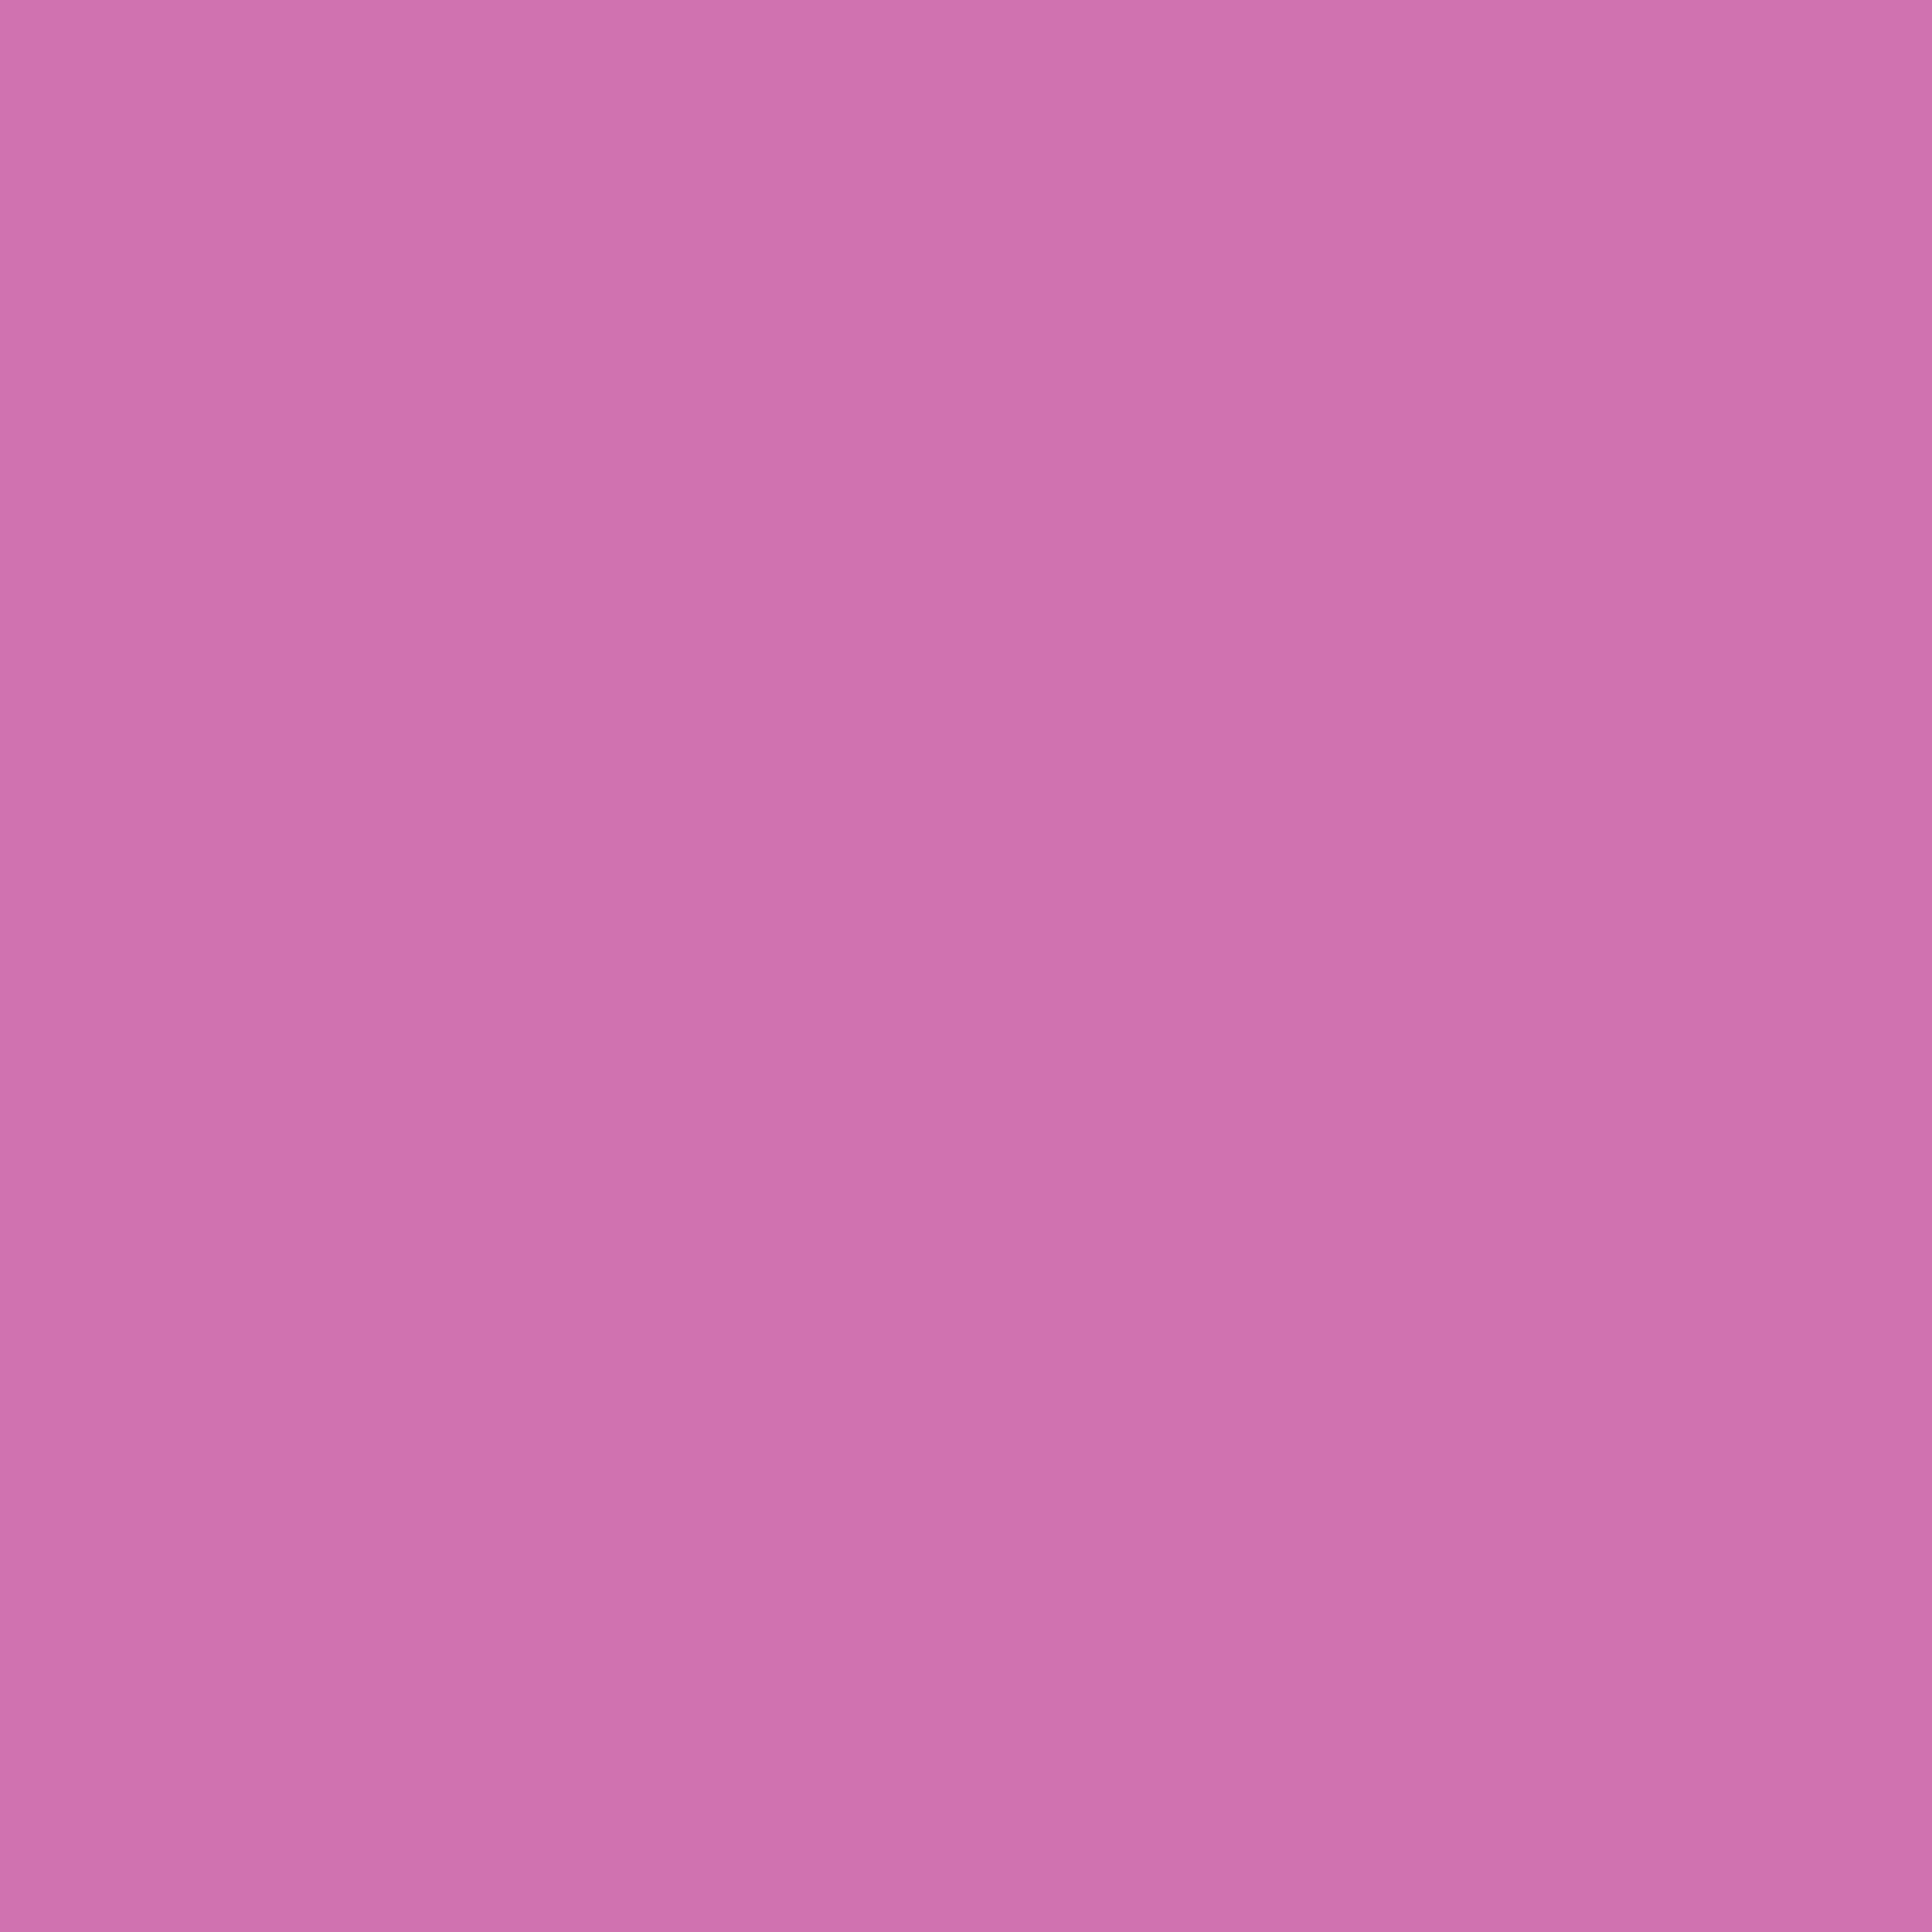 3600x3600 Sky Magenta Solid Color Background